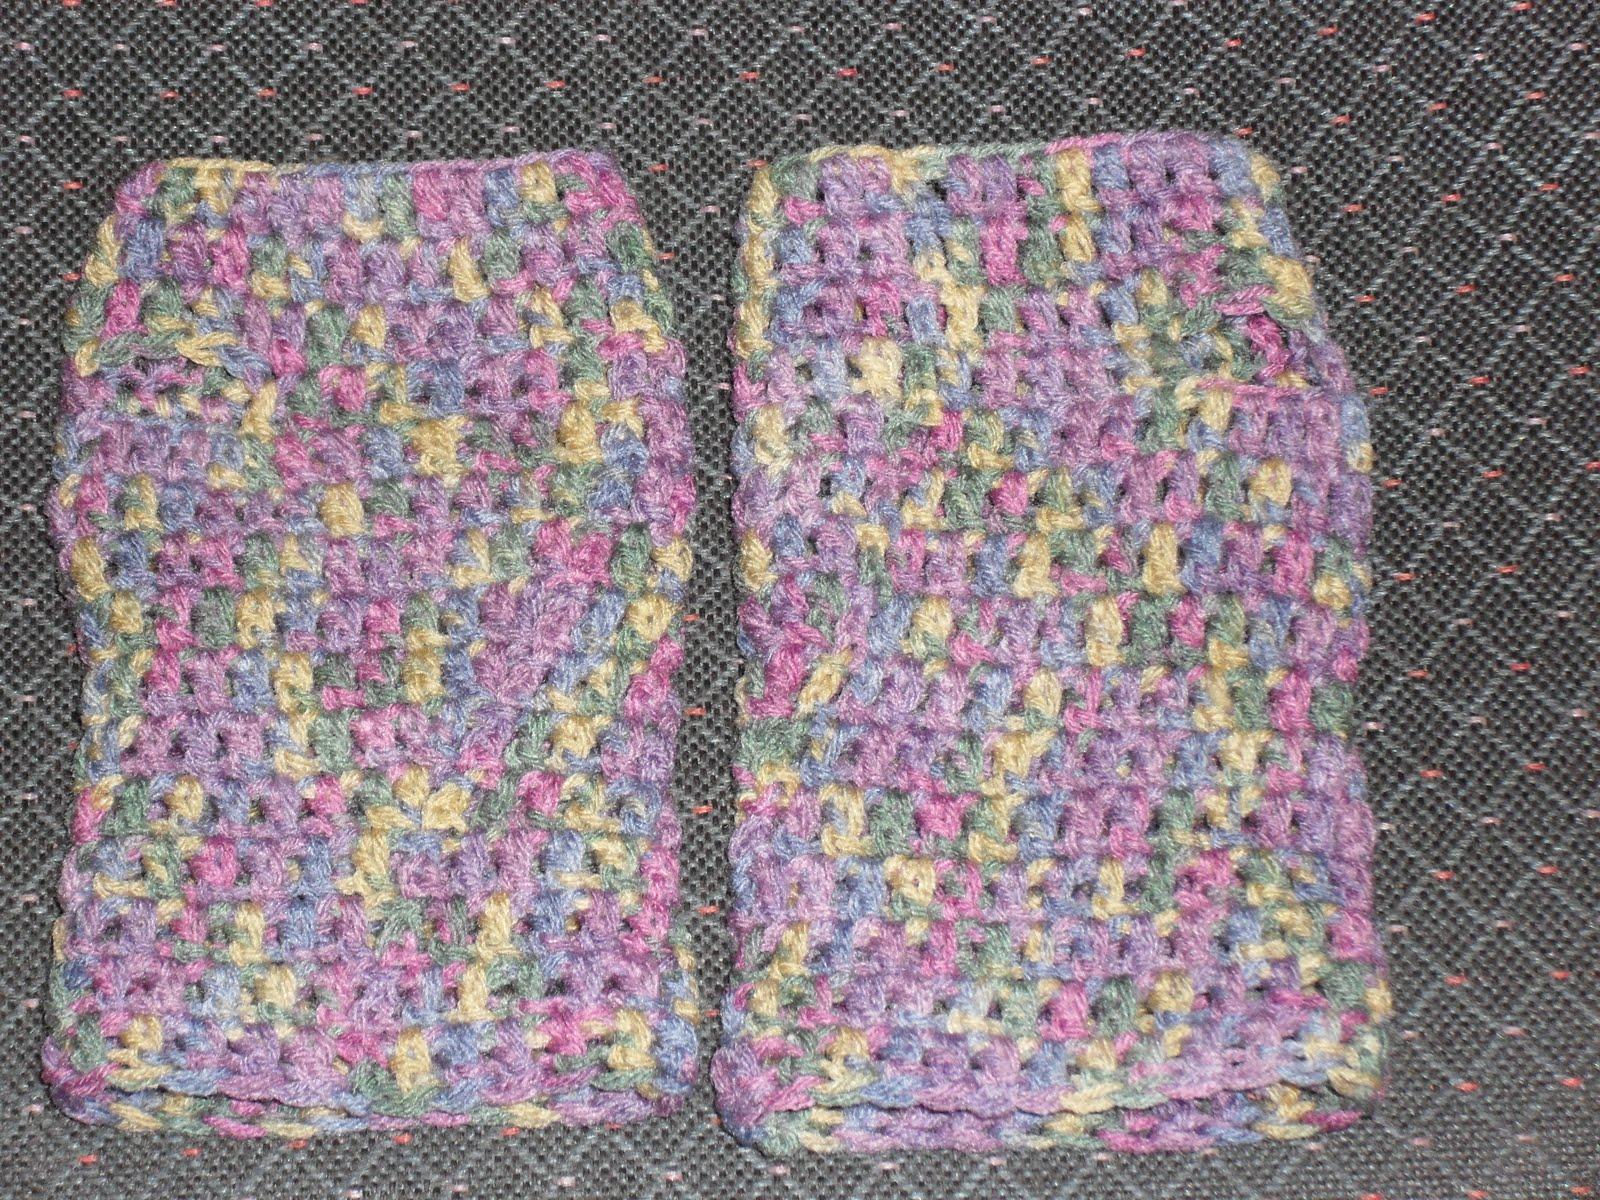 Knitting Yarn Bdo : Made by nomes inspiration and desparation